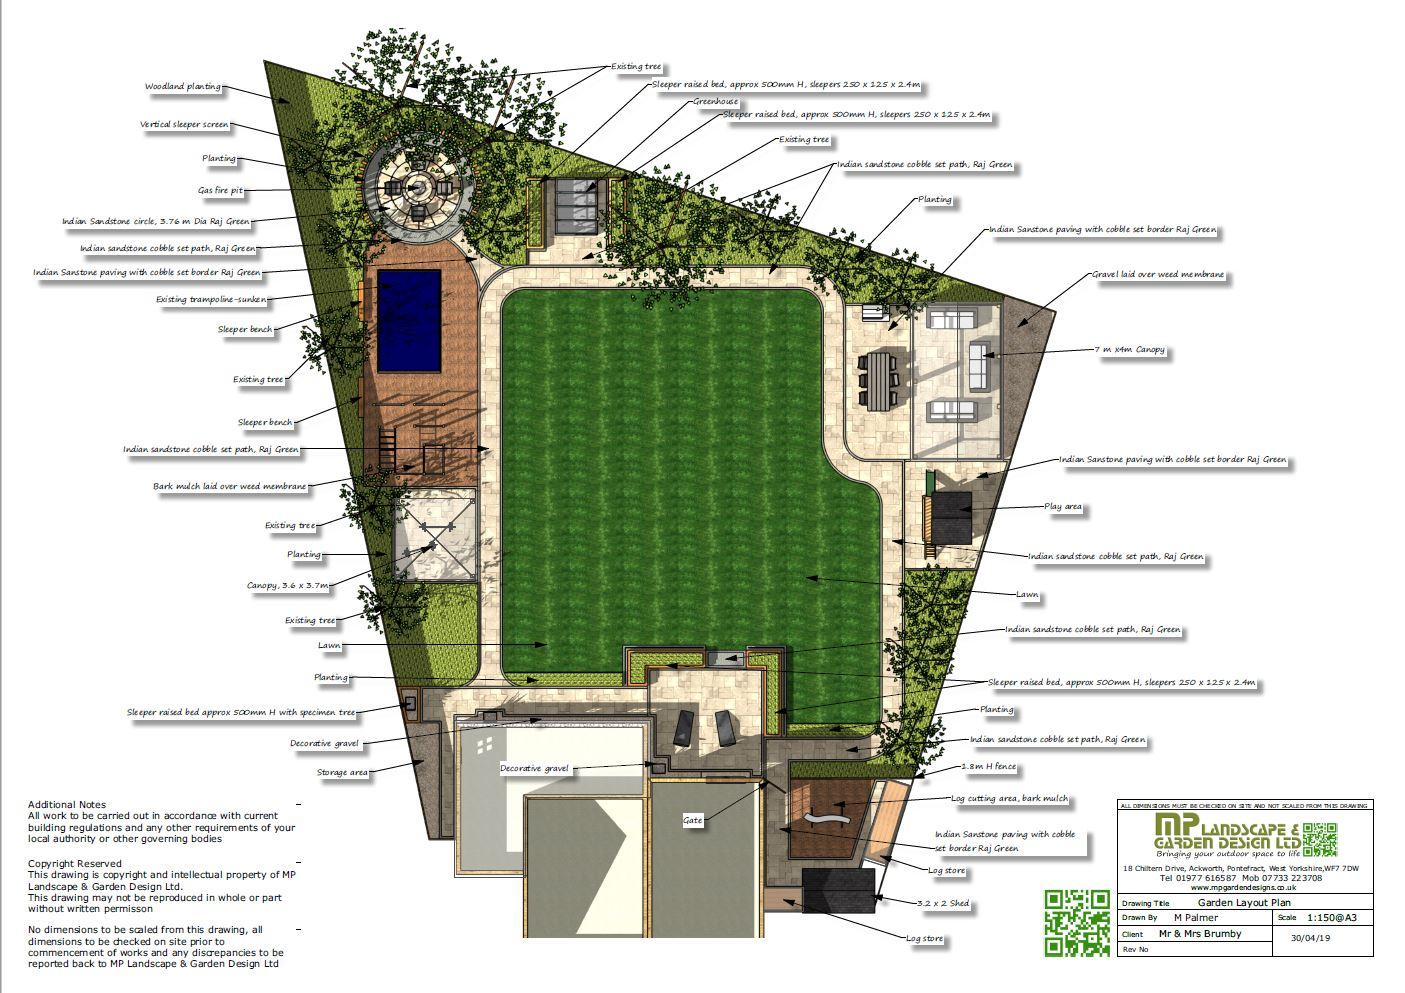 1,Garden layout plans for a rear garden in Darrington